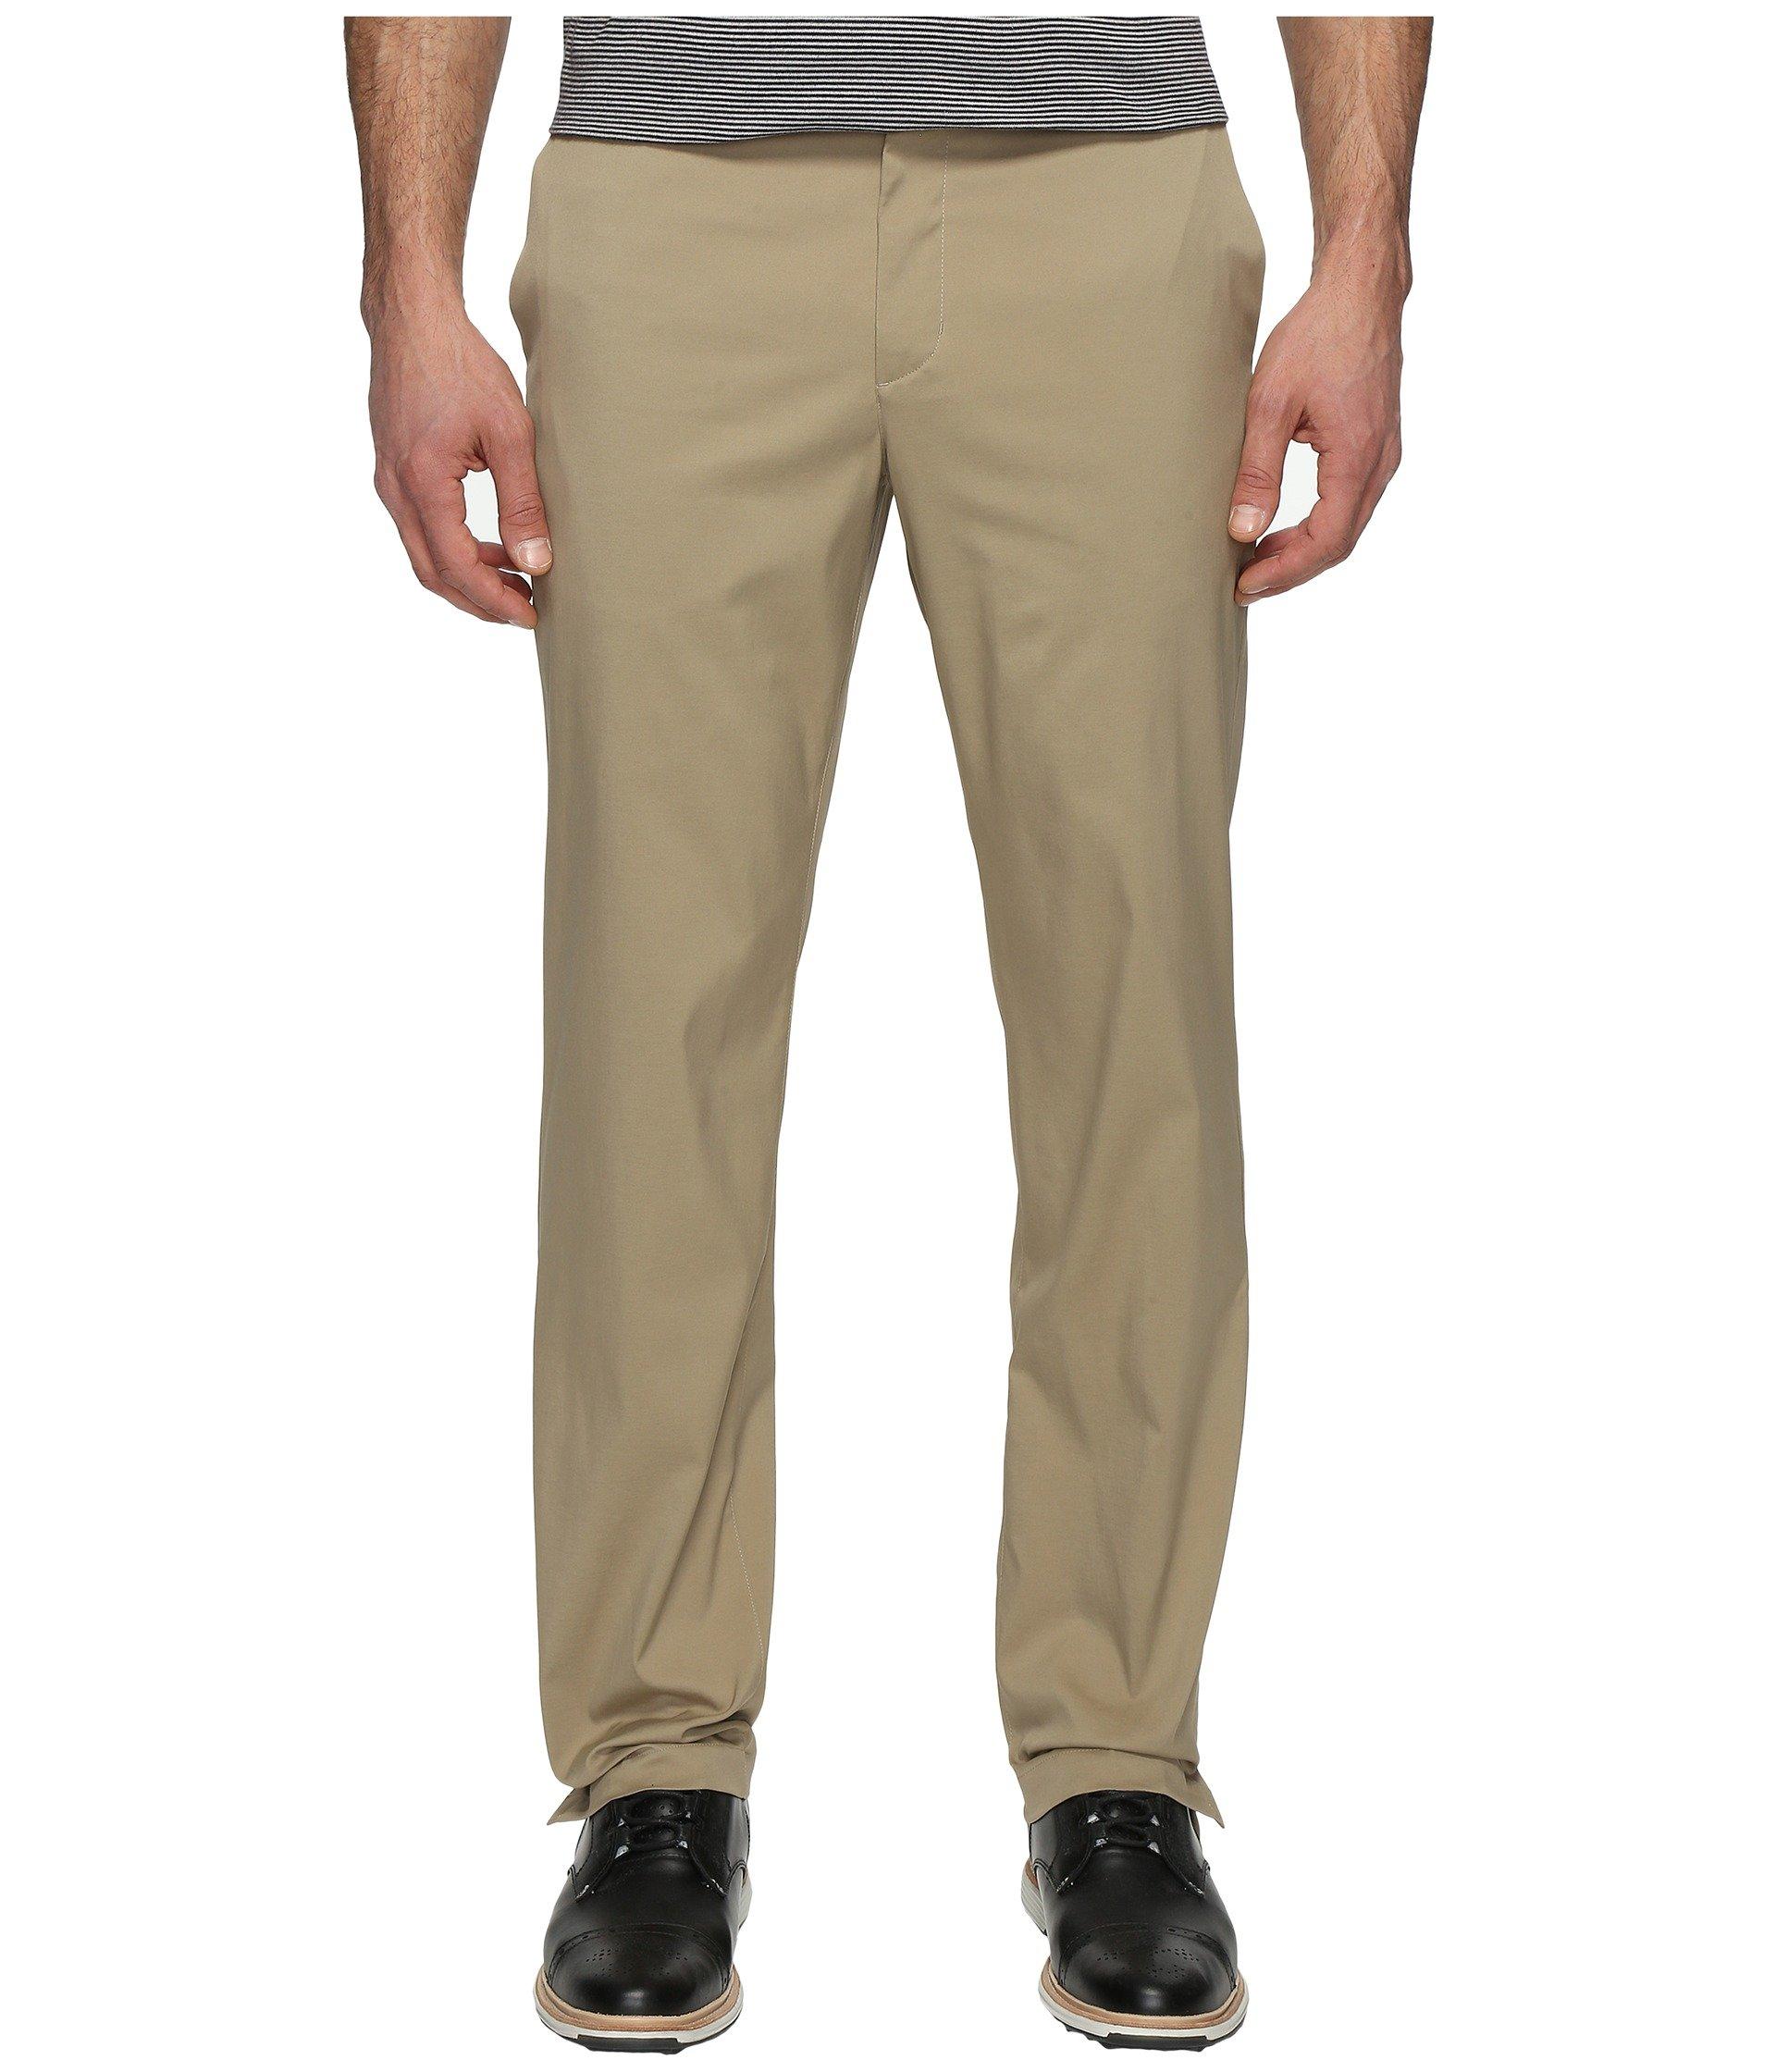 NIKE Men's Flat Front Golf Pants, Khaki/Khaki, Size 36/30